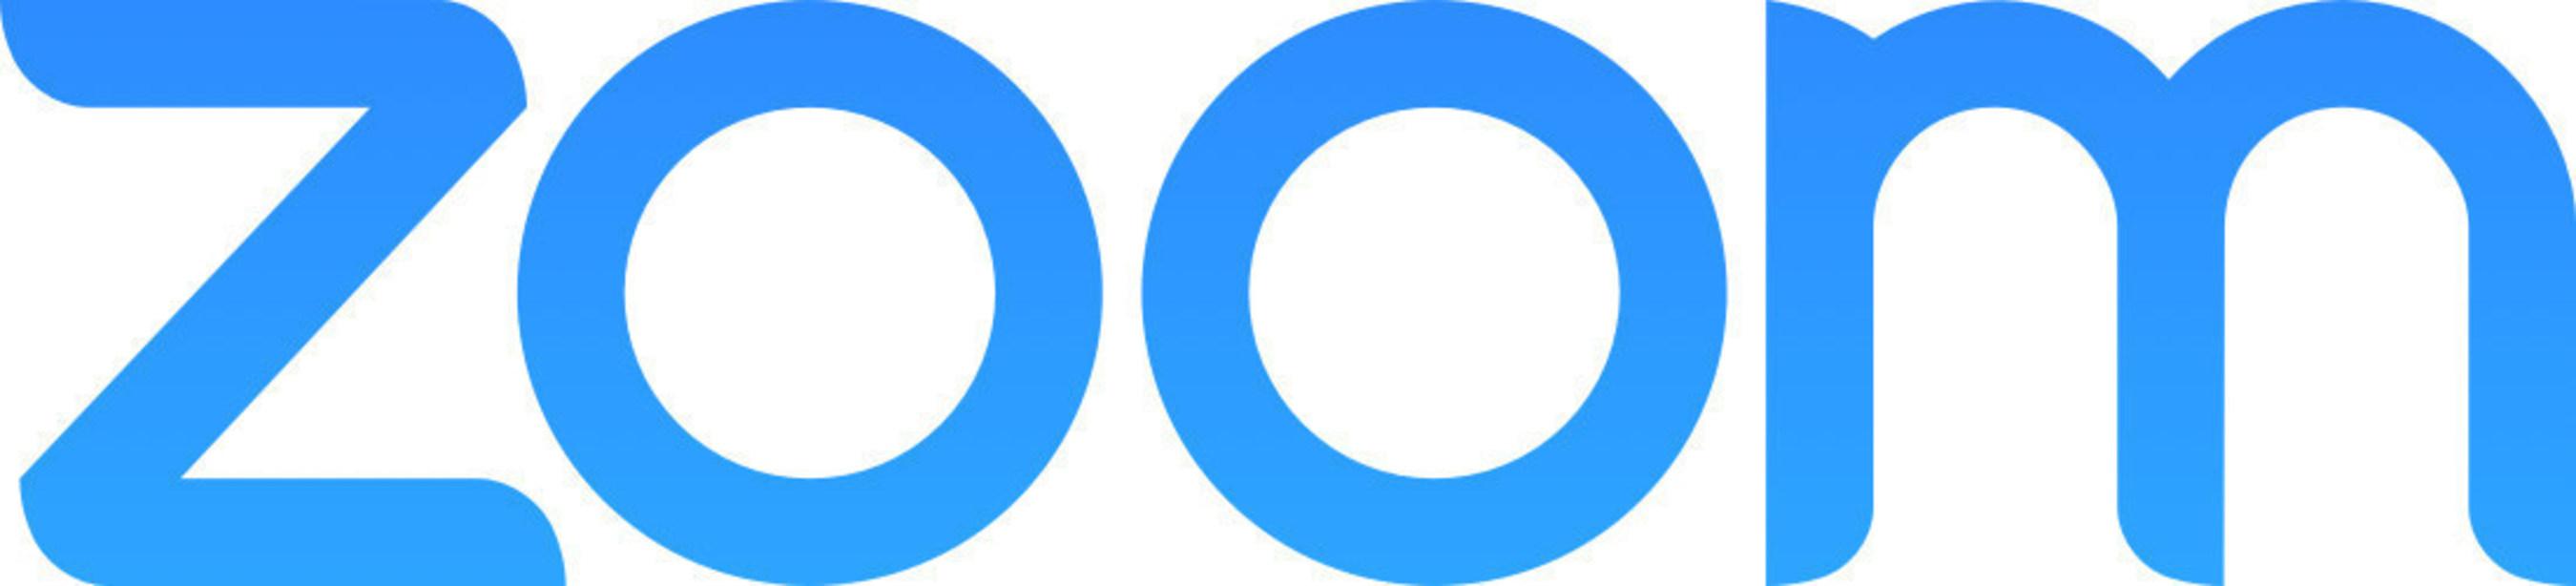 Logo Zoom - Konferenztool bei Time-Visions